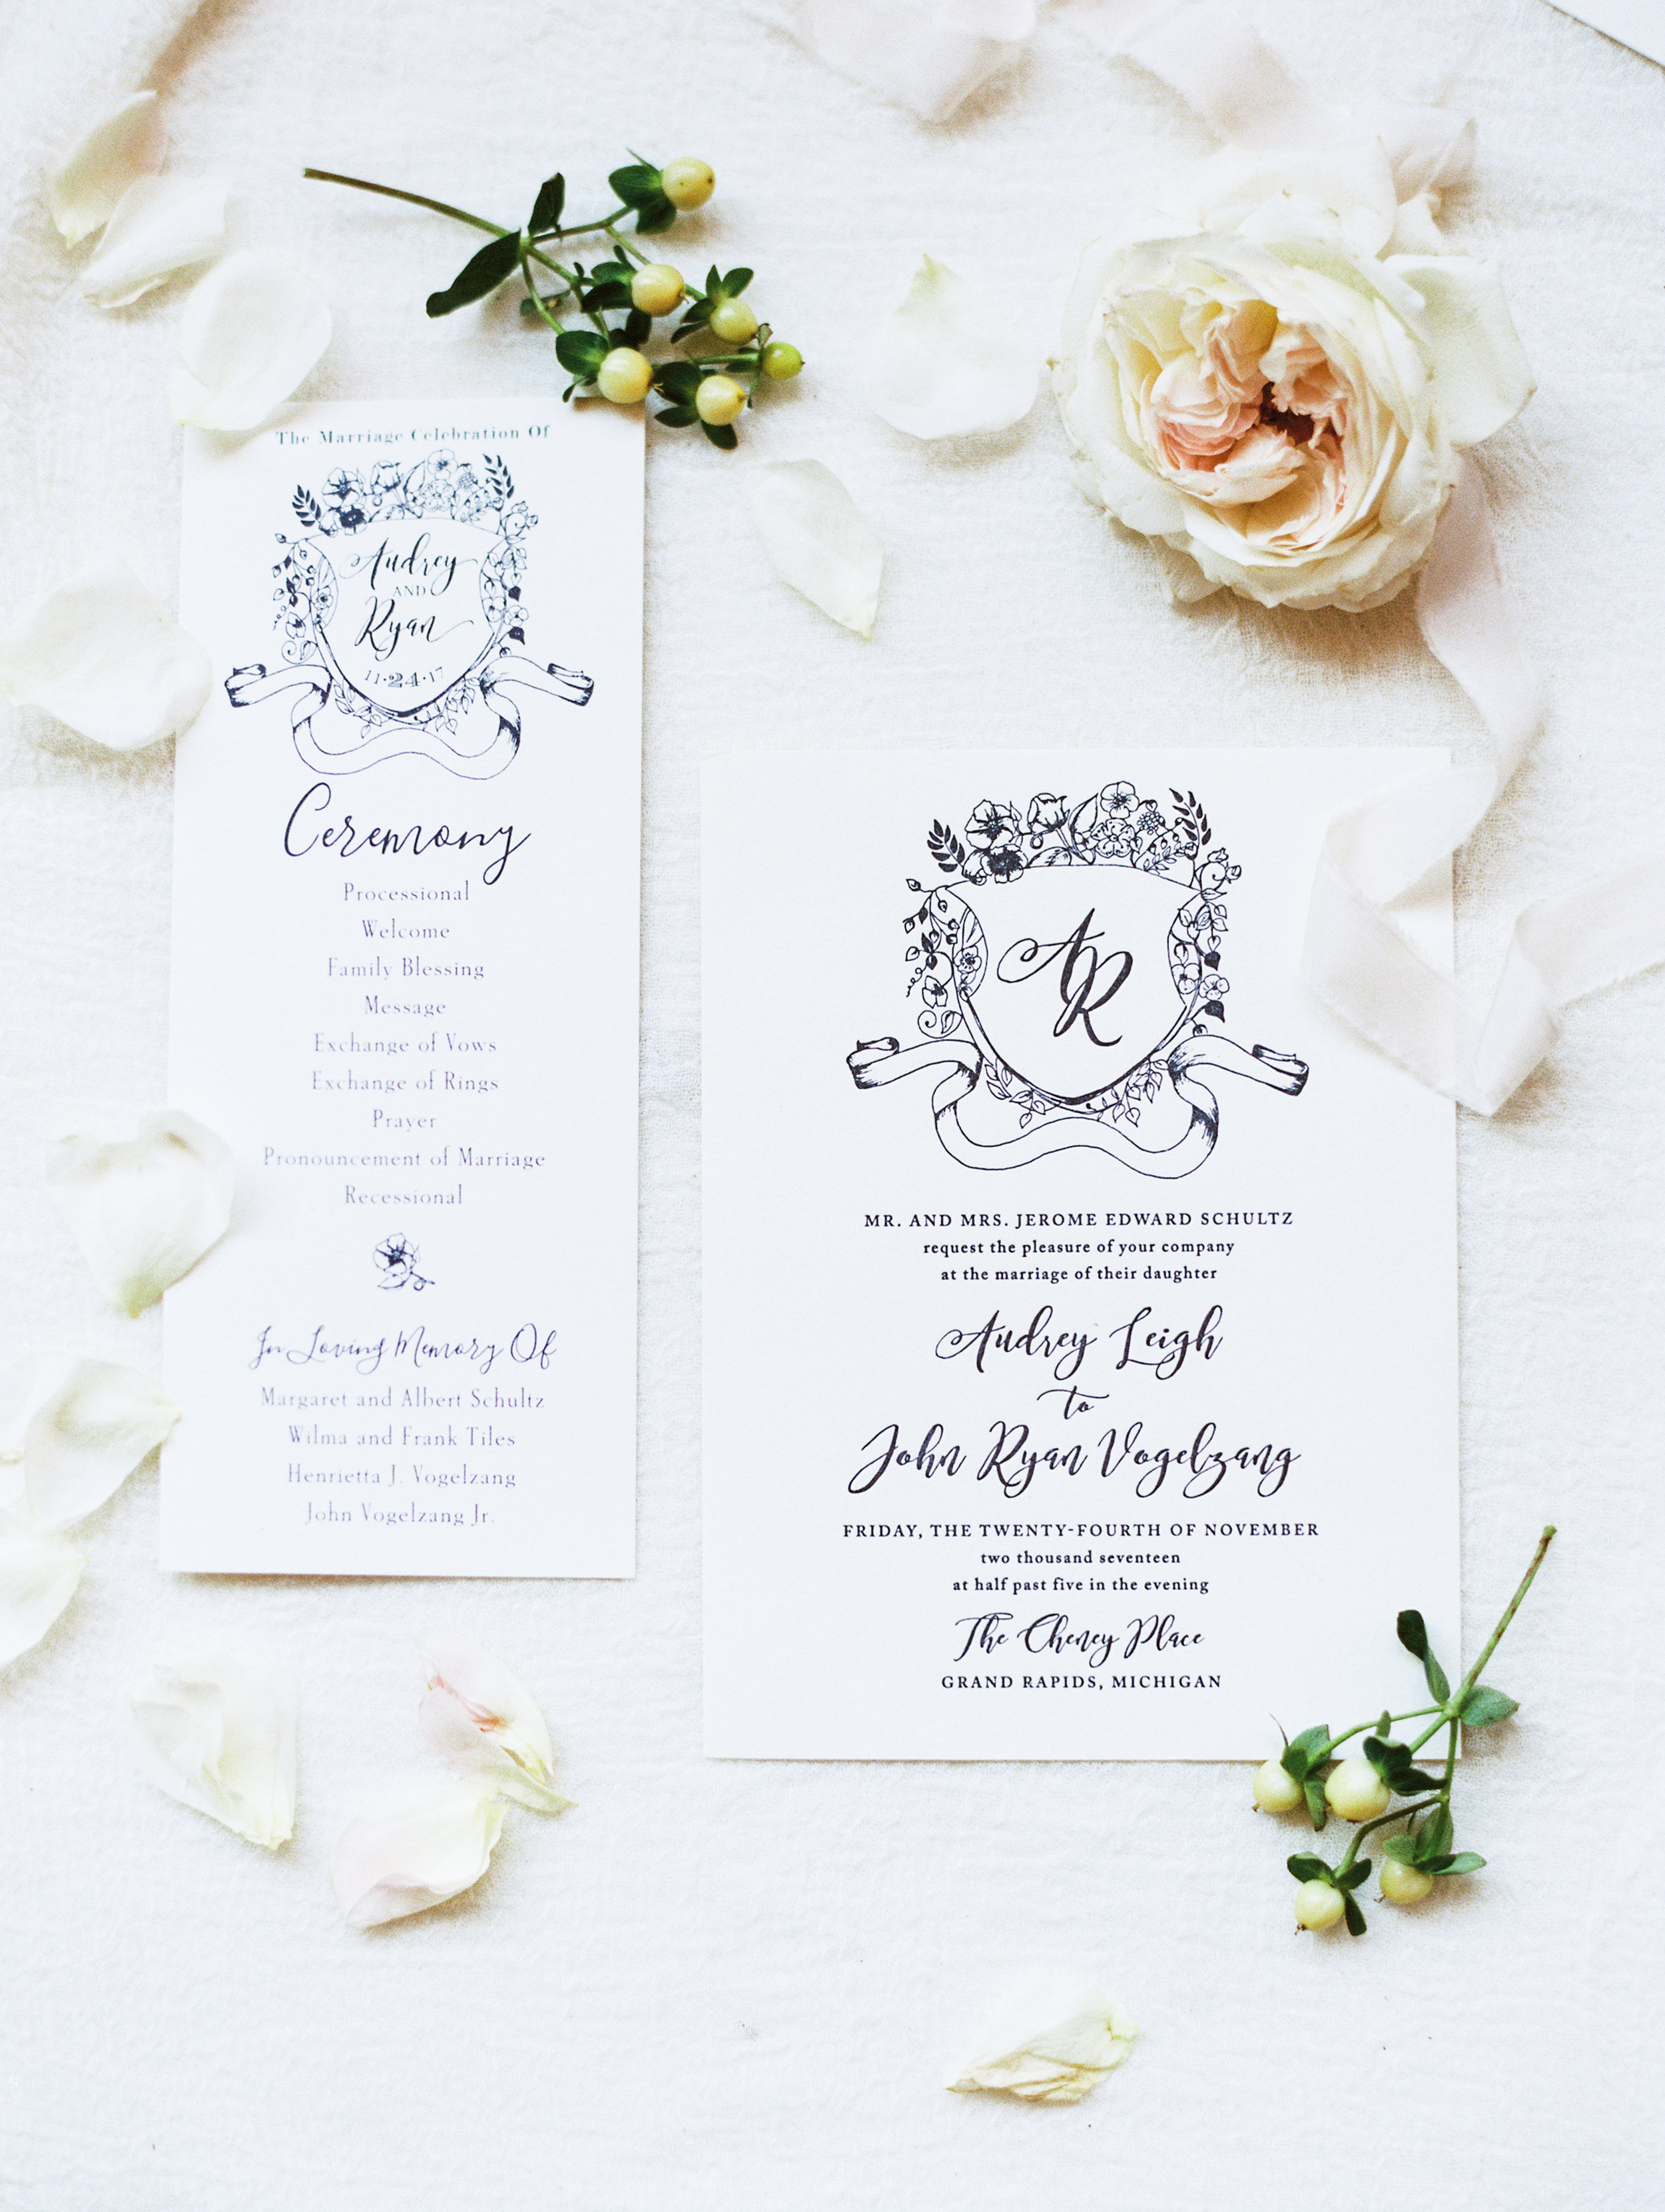 Vogelzang+Wedding+Details+b-45.jpg